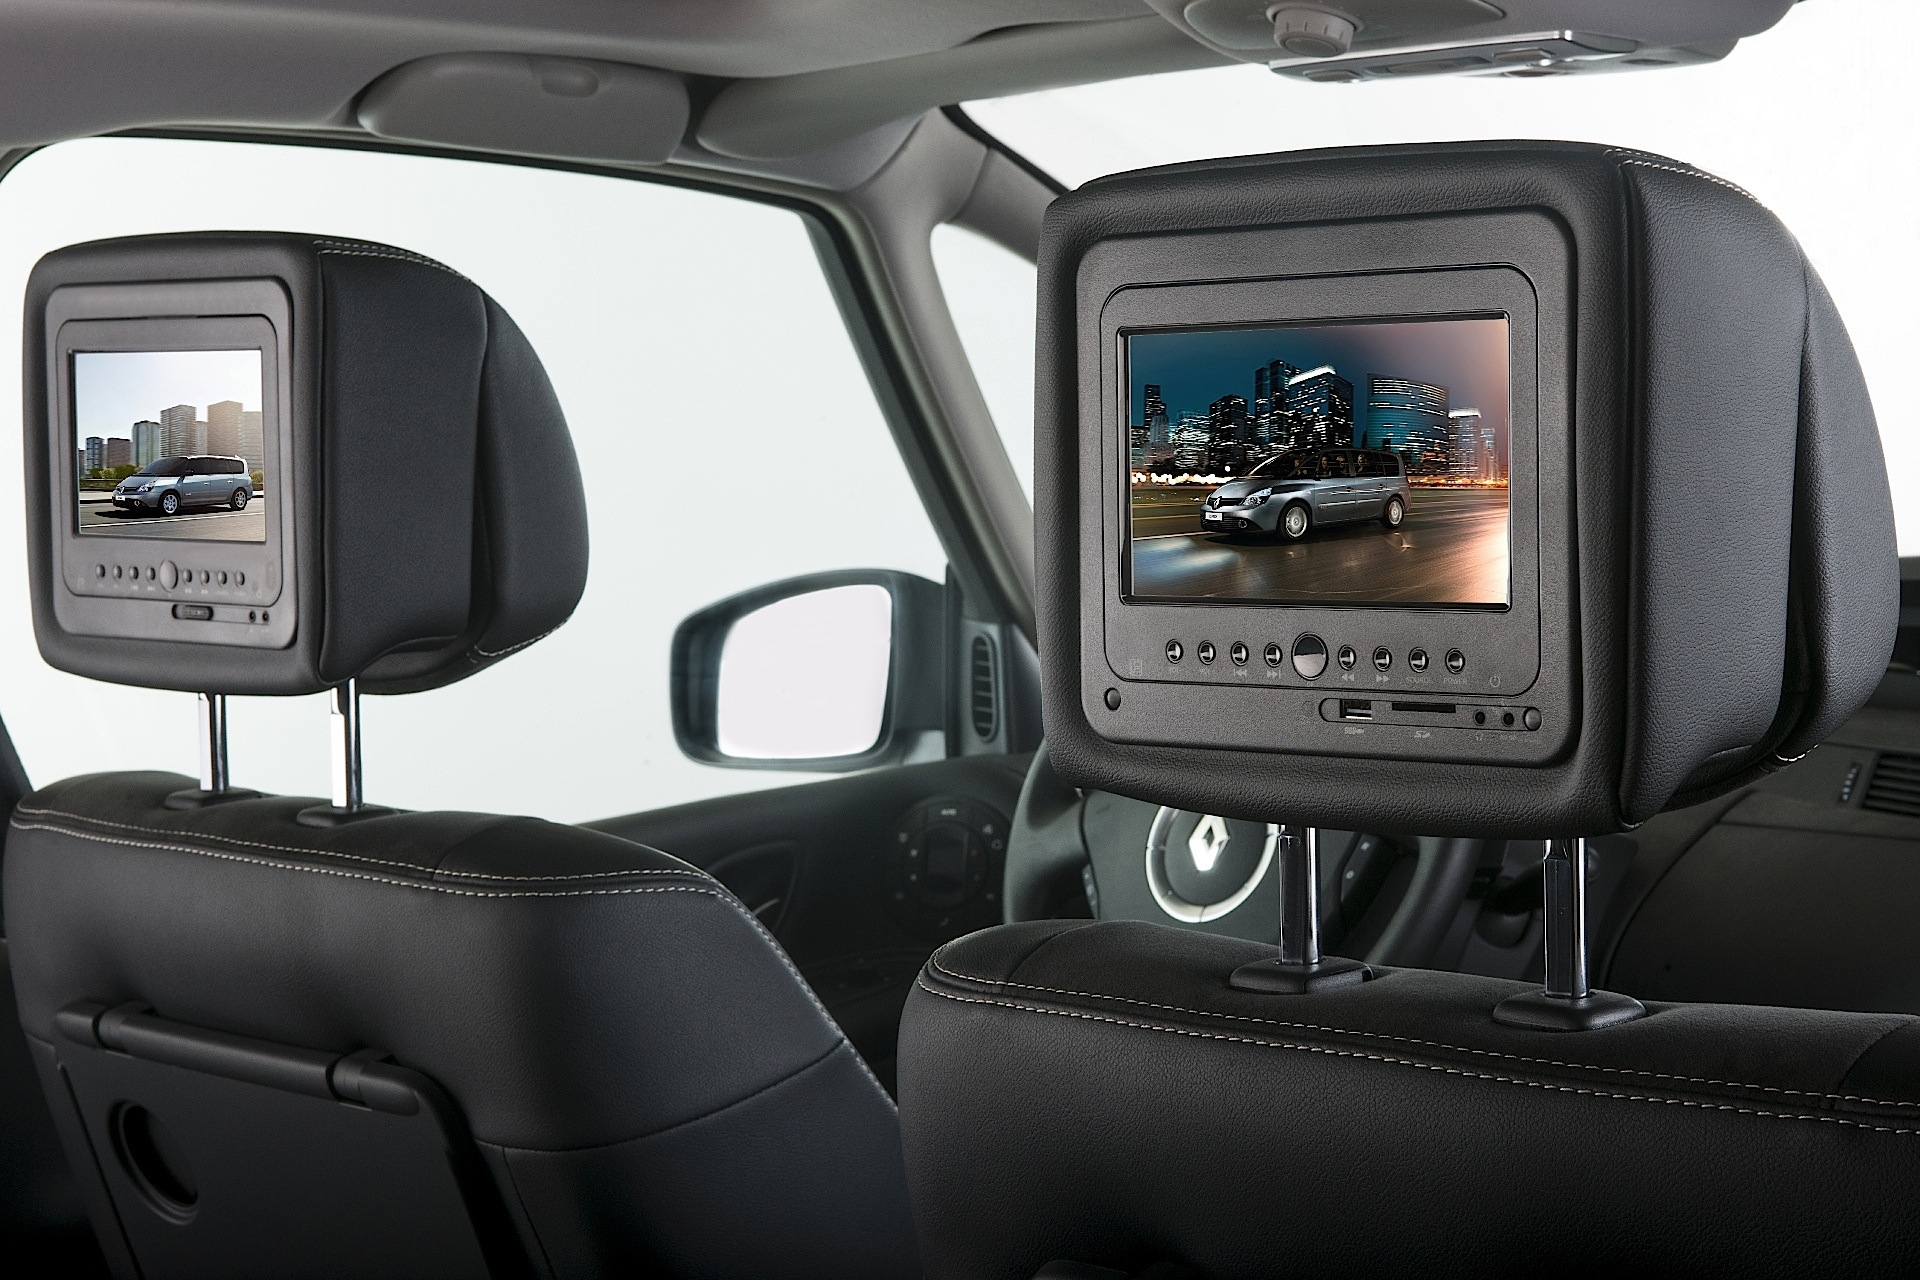 Renault Espace 2006 2007 2008 2009 2010 2011 2012